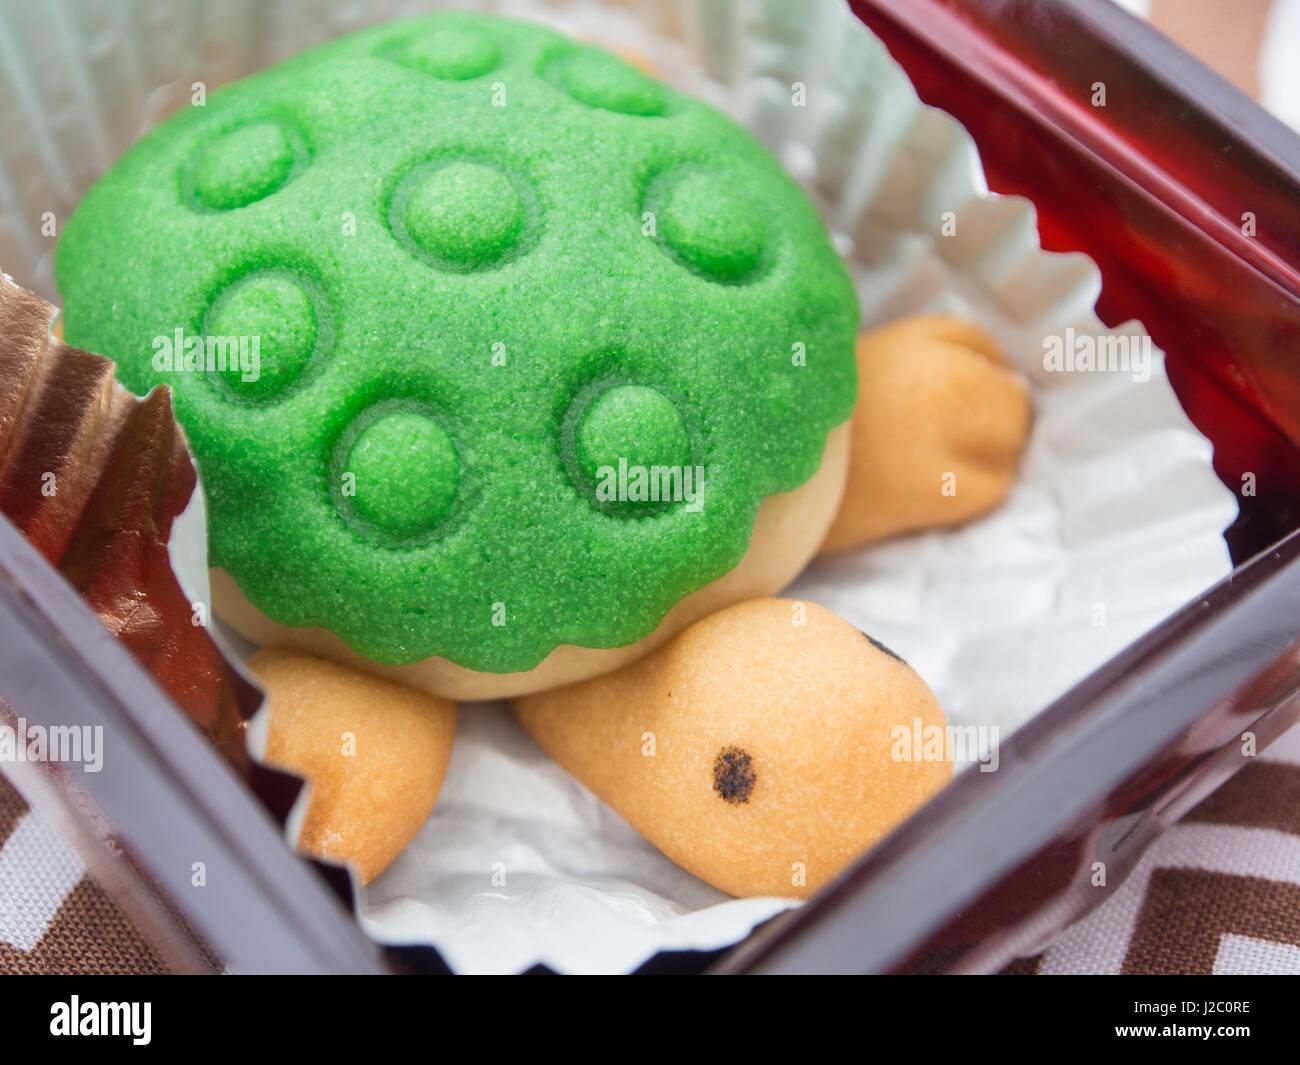 Cute Turtle Shaped Cake Stock Photo 139176338 Alamy